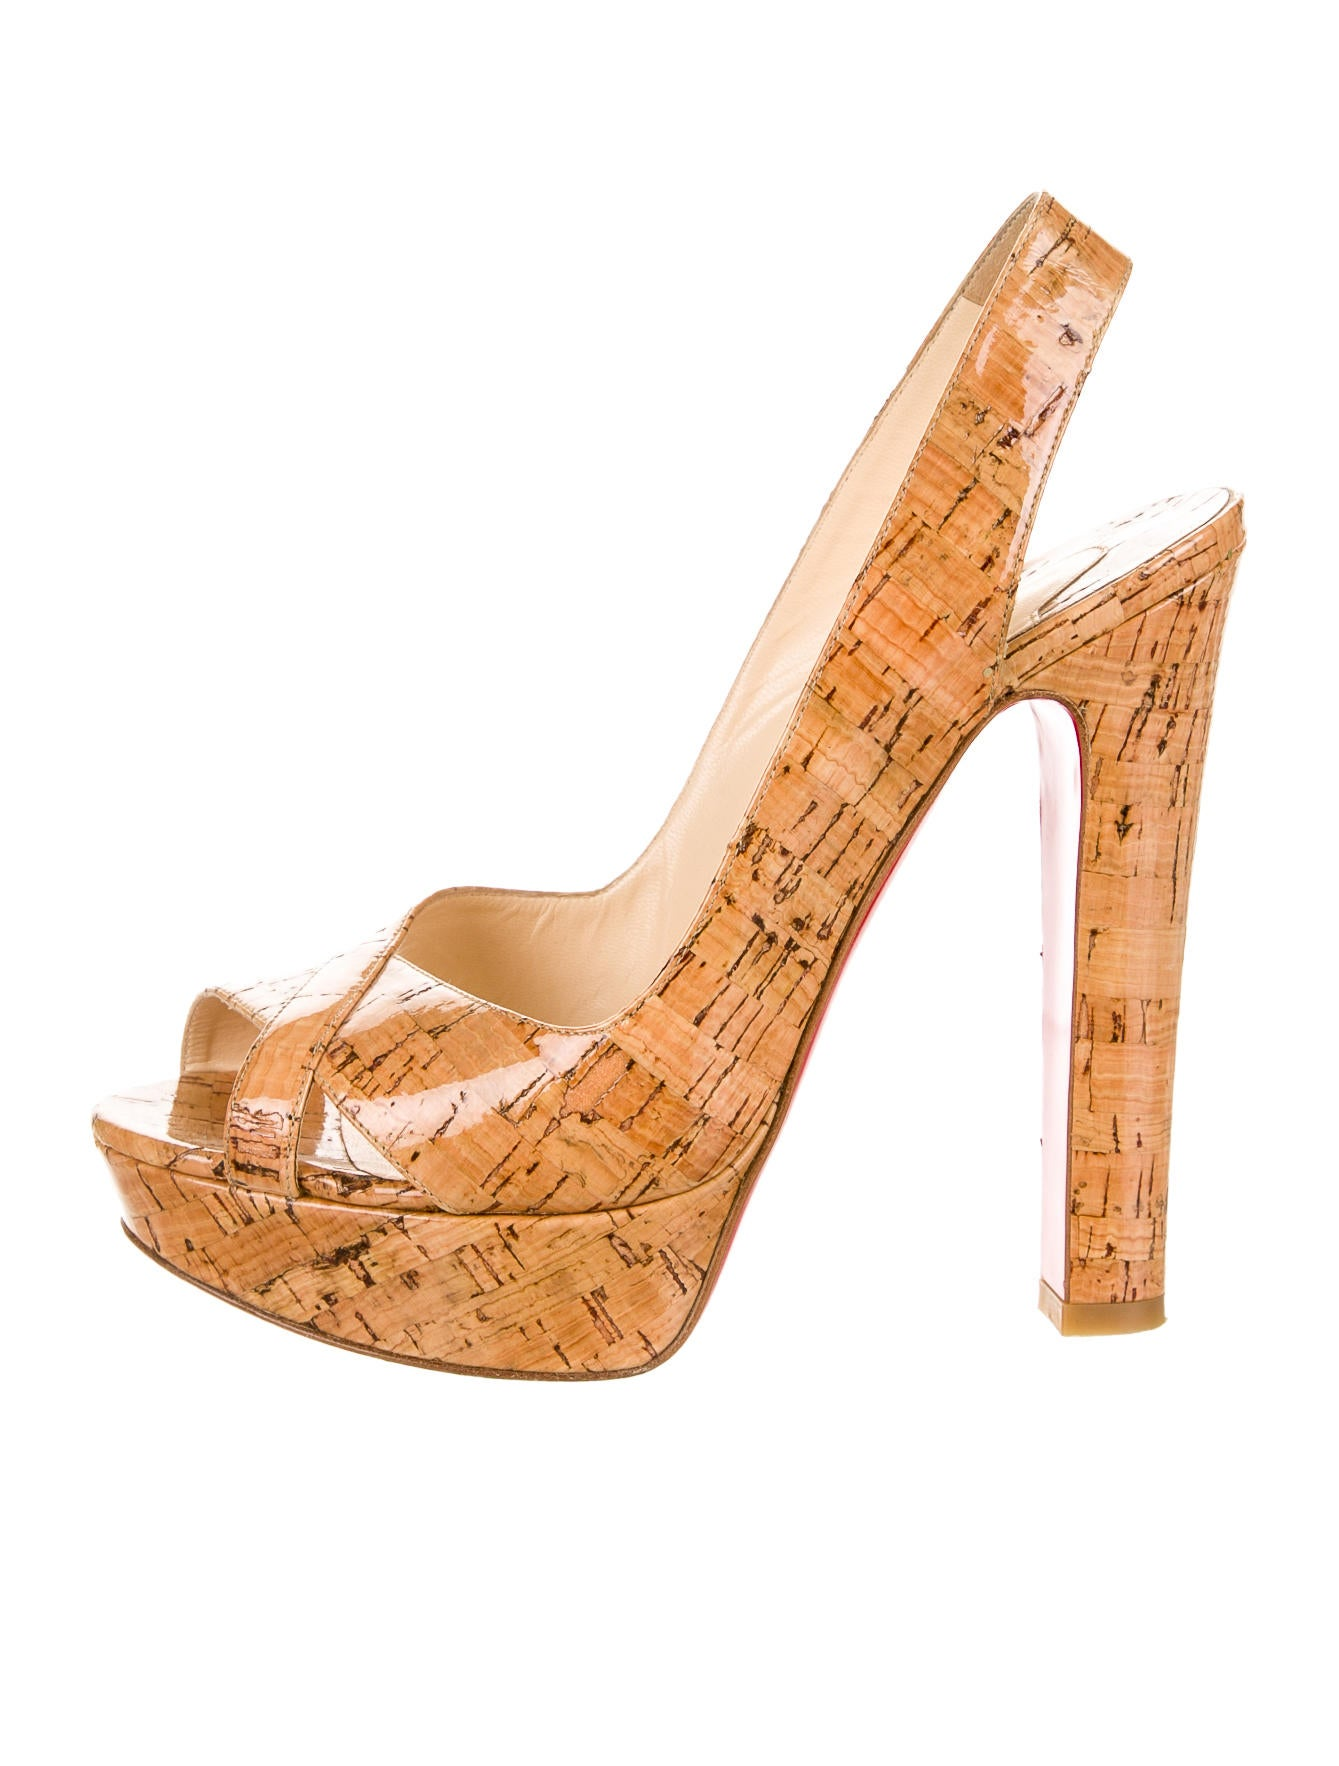 Artesur ? christian louboutin platform sandals Tan coated cork ...